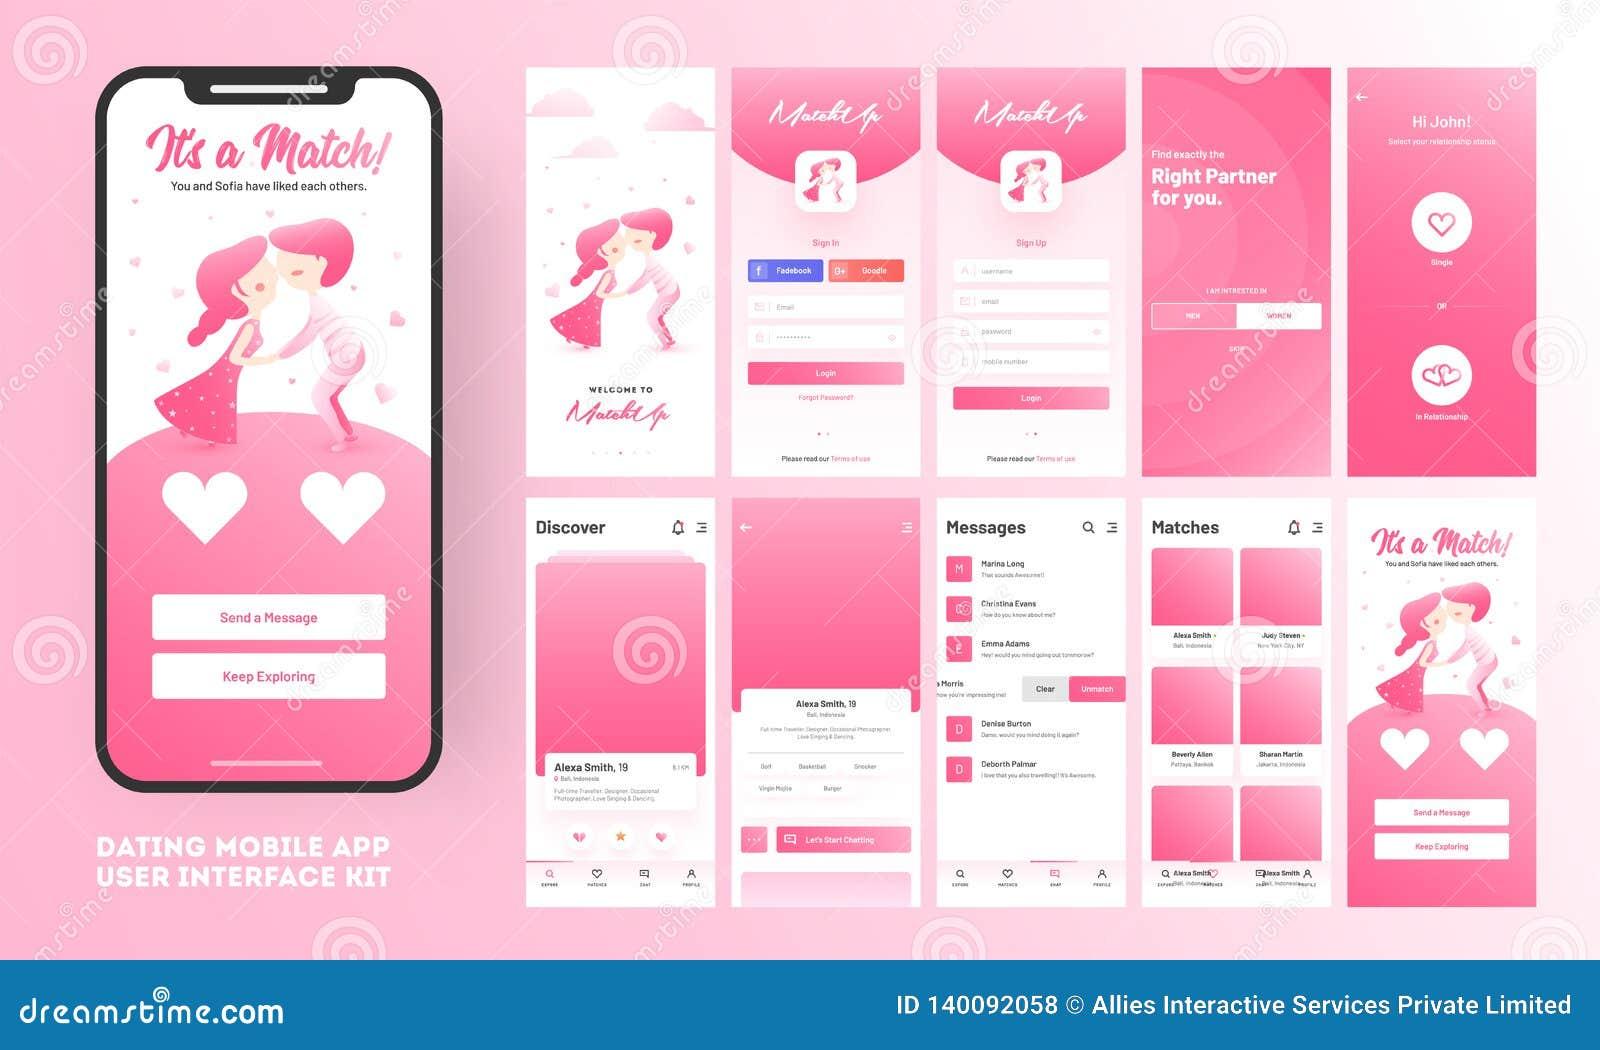 match dating mobil app